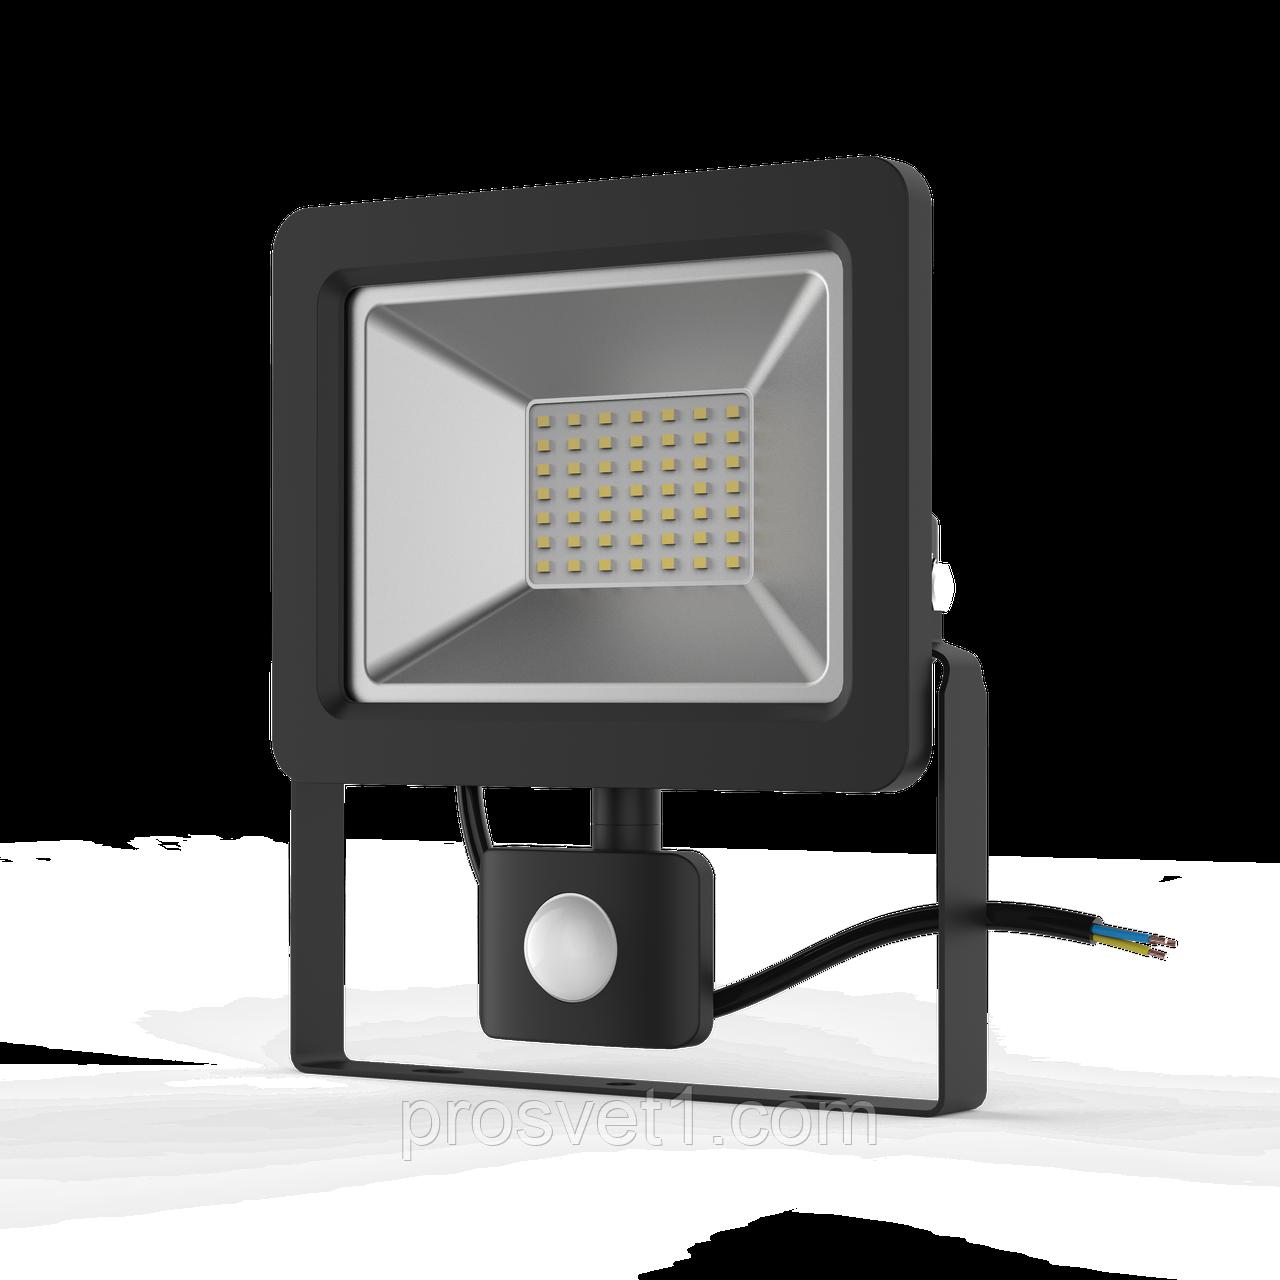 Прожектор LED Гаусса 50W 6500К IP65 з датчиком руху